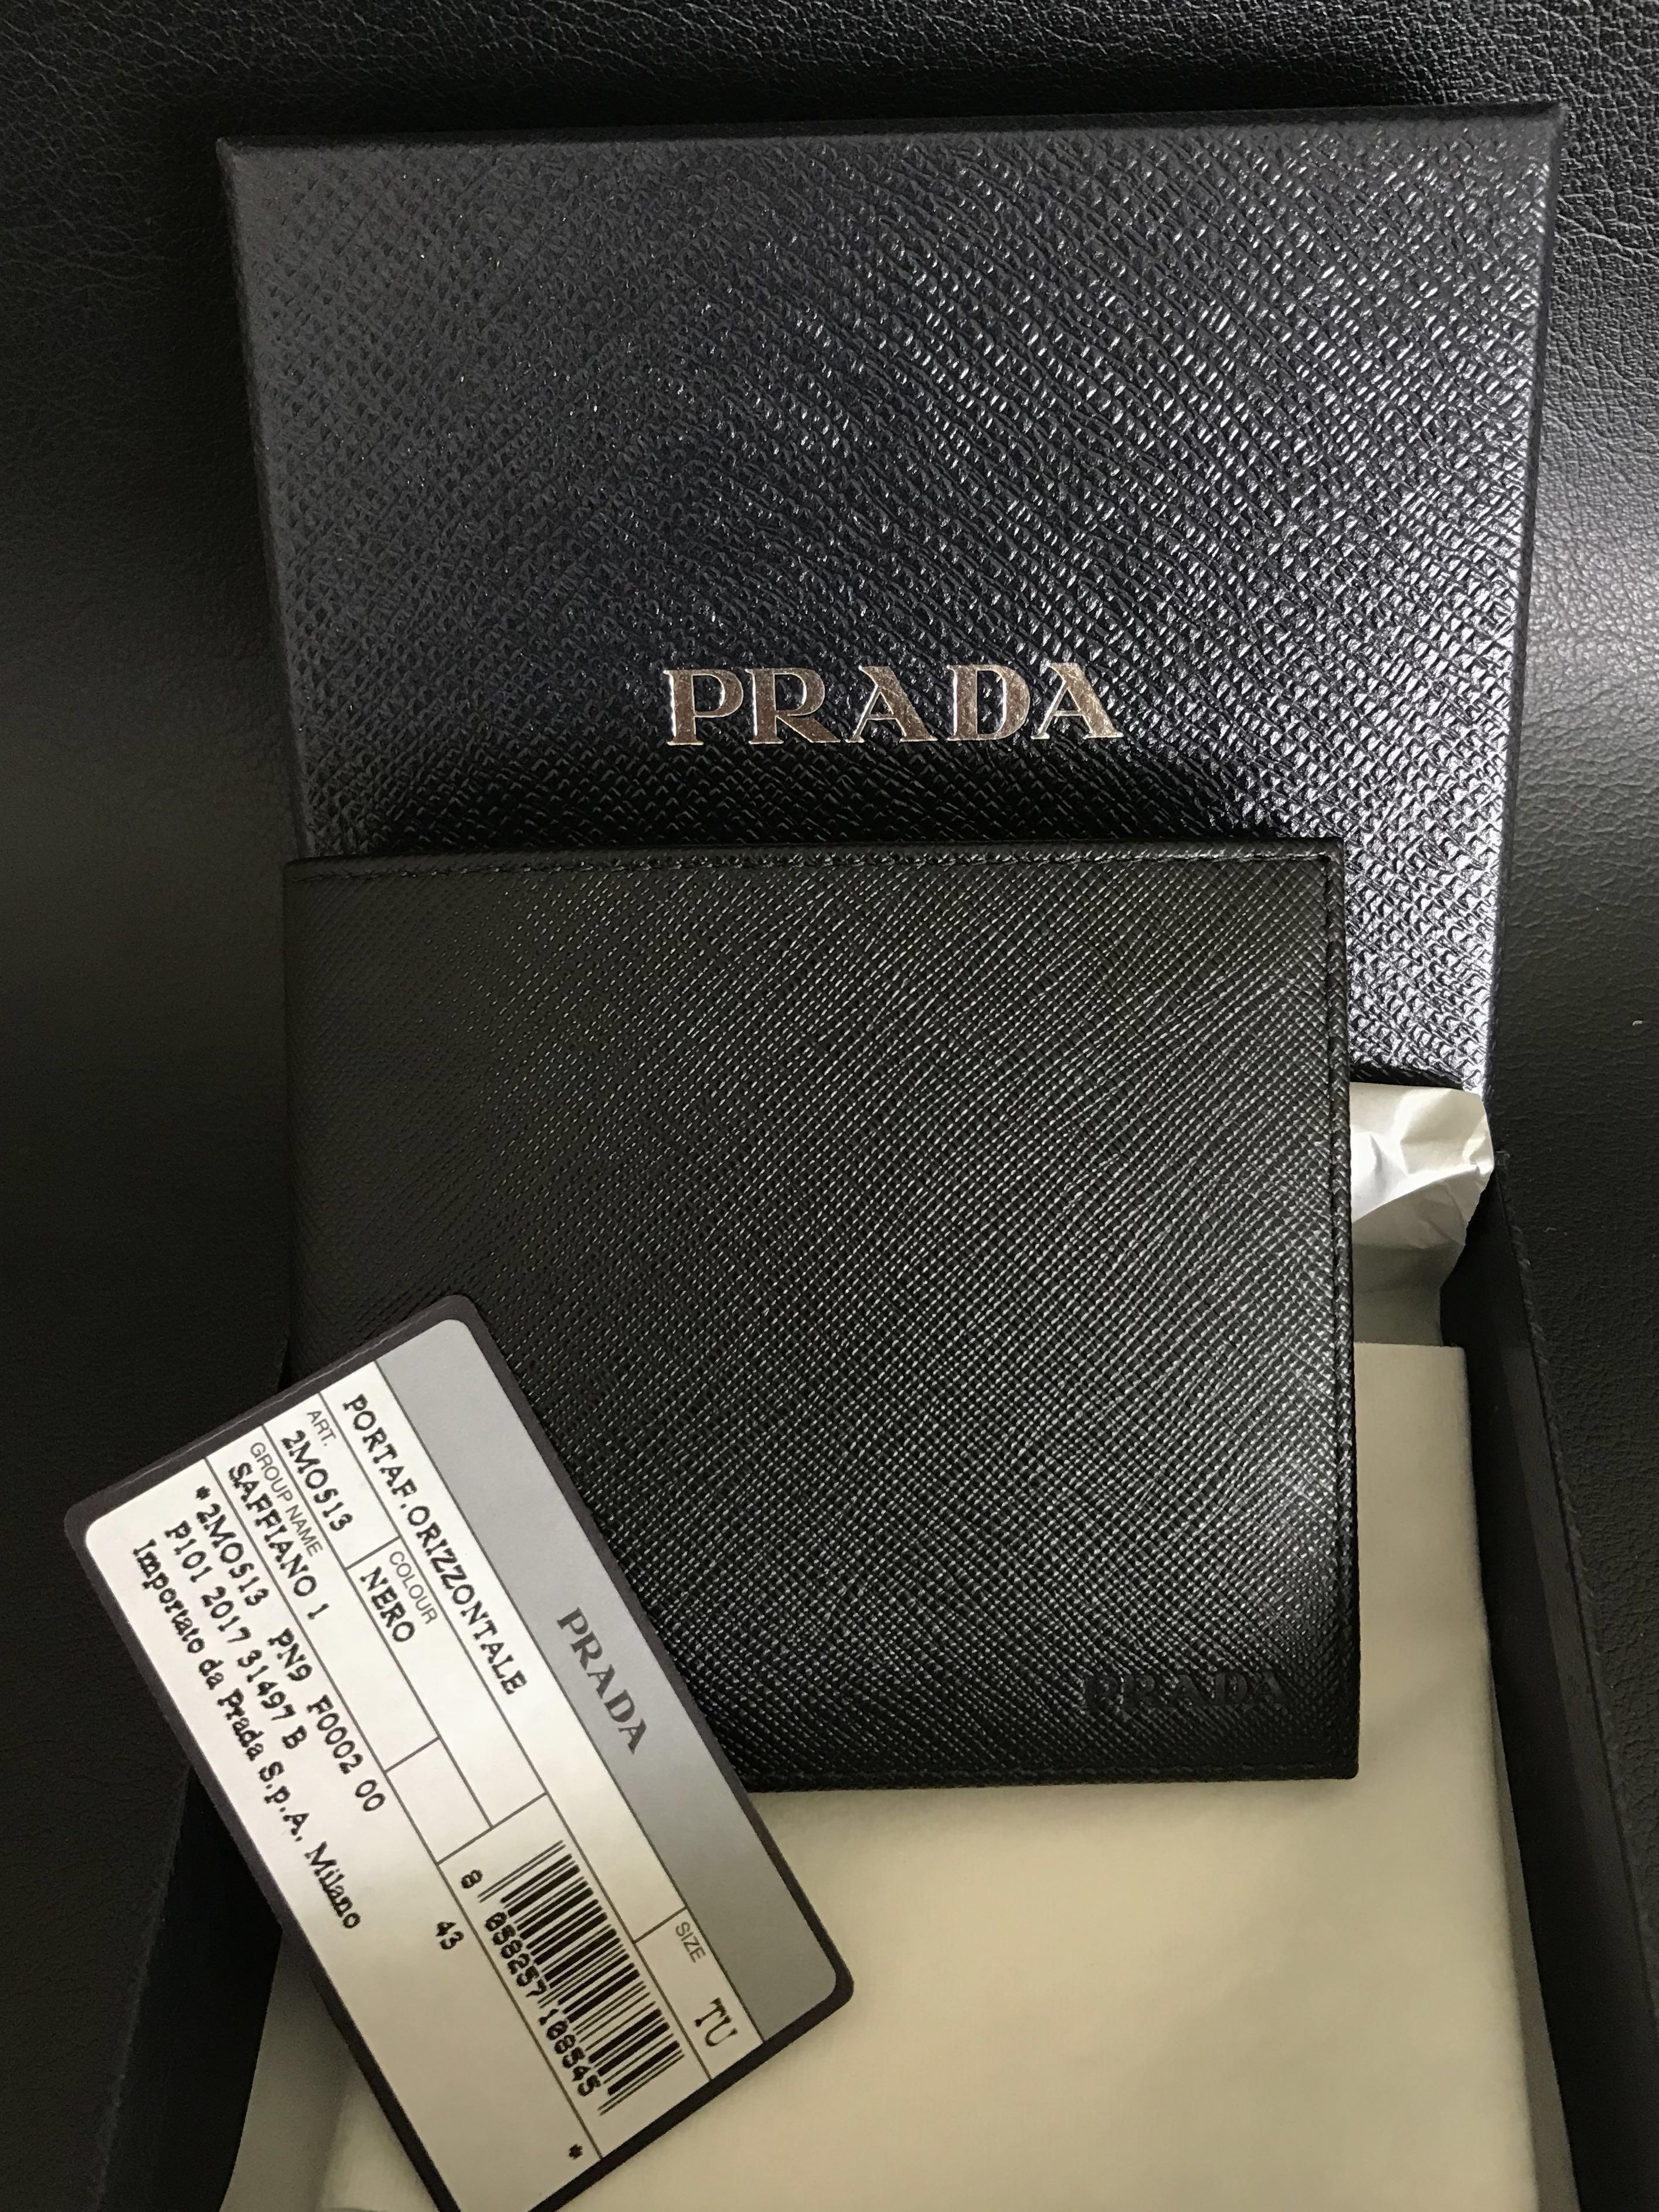 9714d0fa0d98d8 Prada Saffiano Men's Wallet Embossed (Black), Men's Fashion, Bags ...